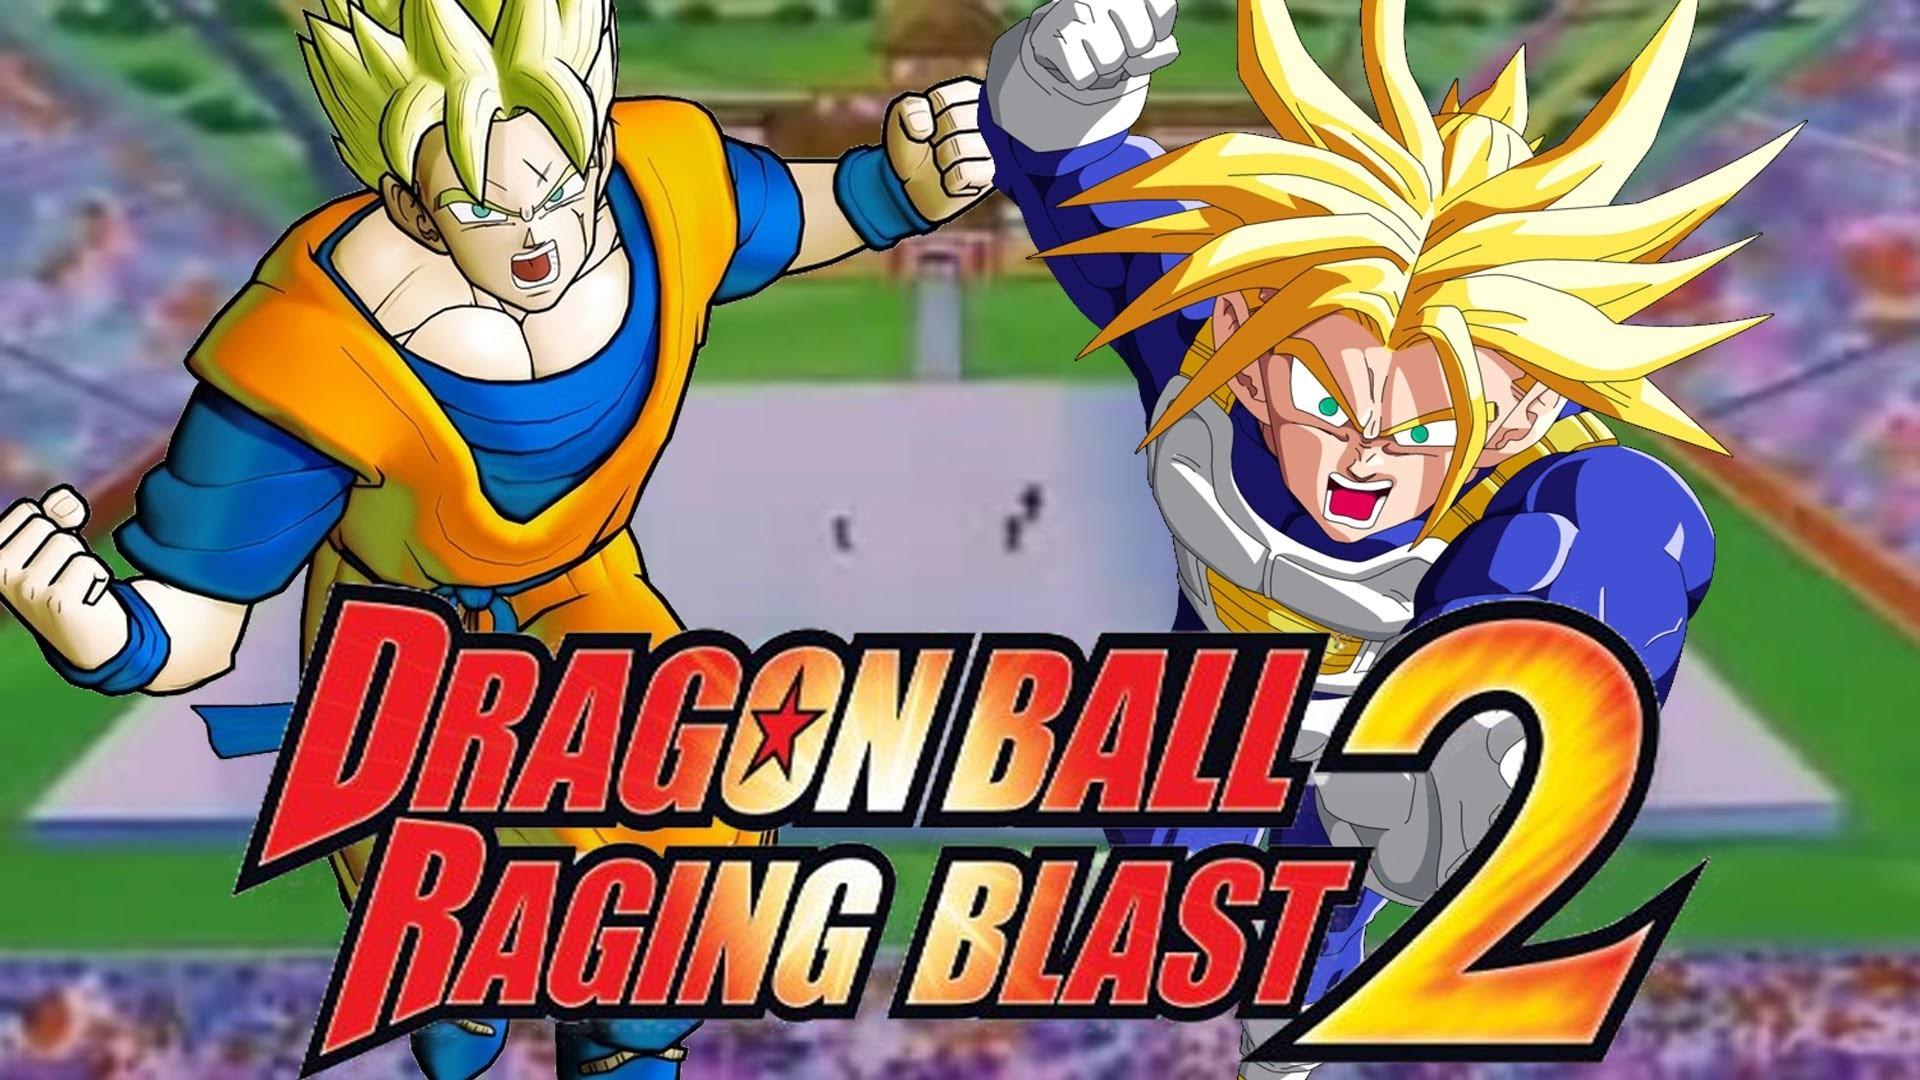 Dragonball Raging Blast 2: SSJ Future Gohan VS SSJ Future Trunks  (Gameplay/Commentary) – YouTube